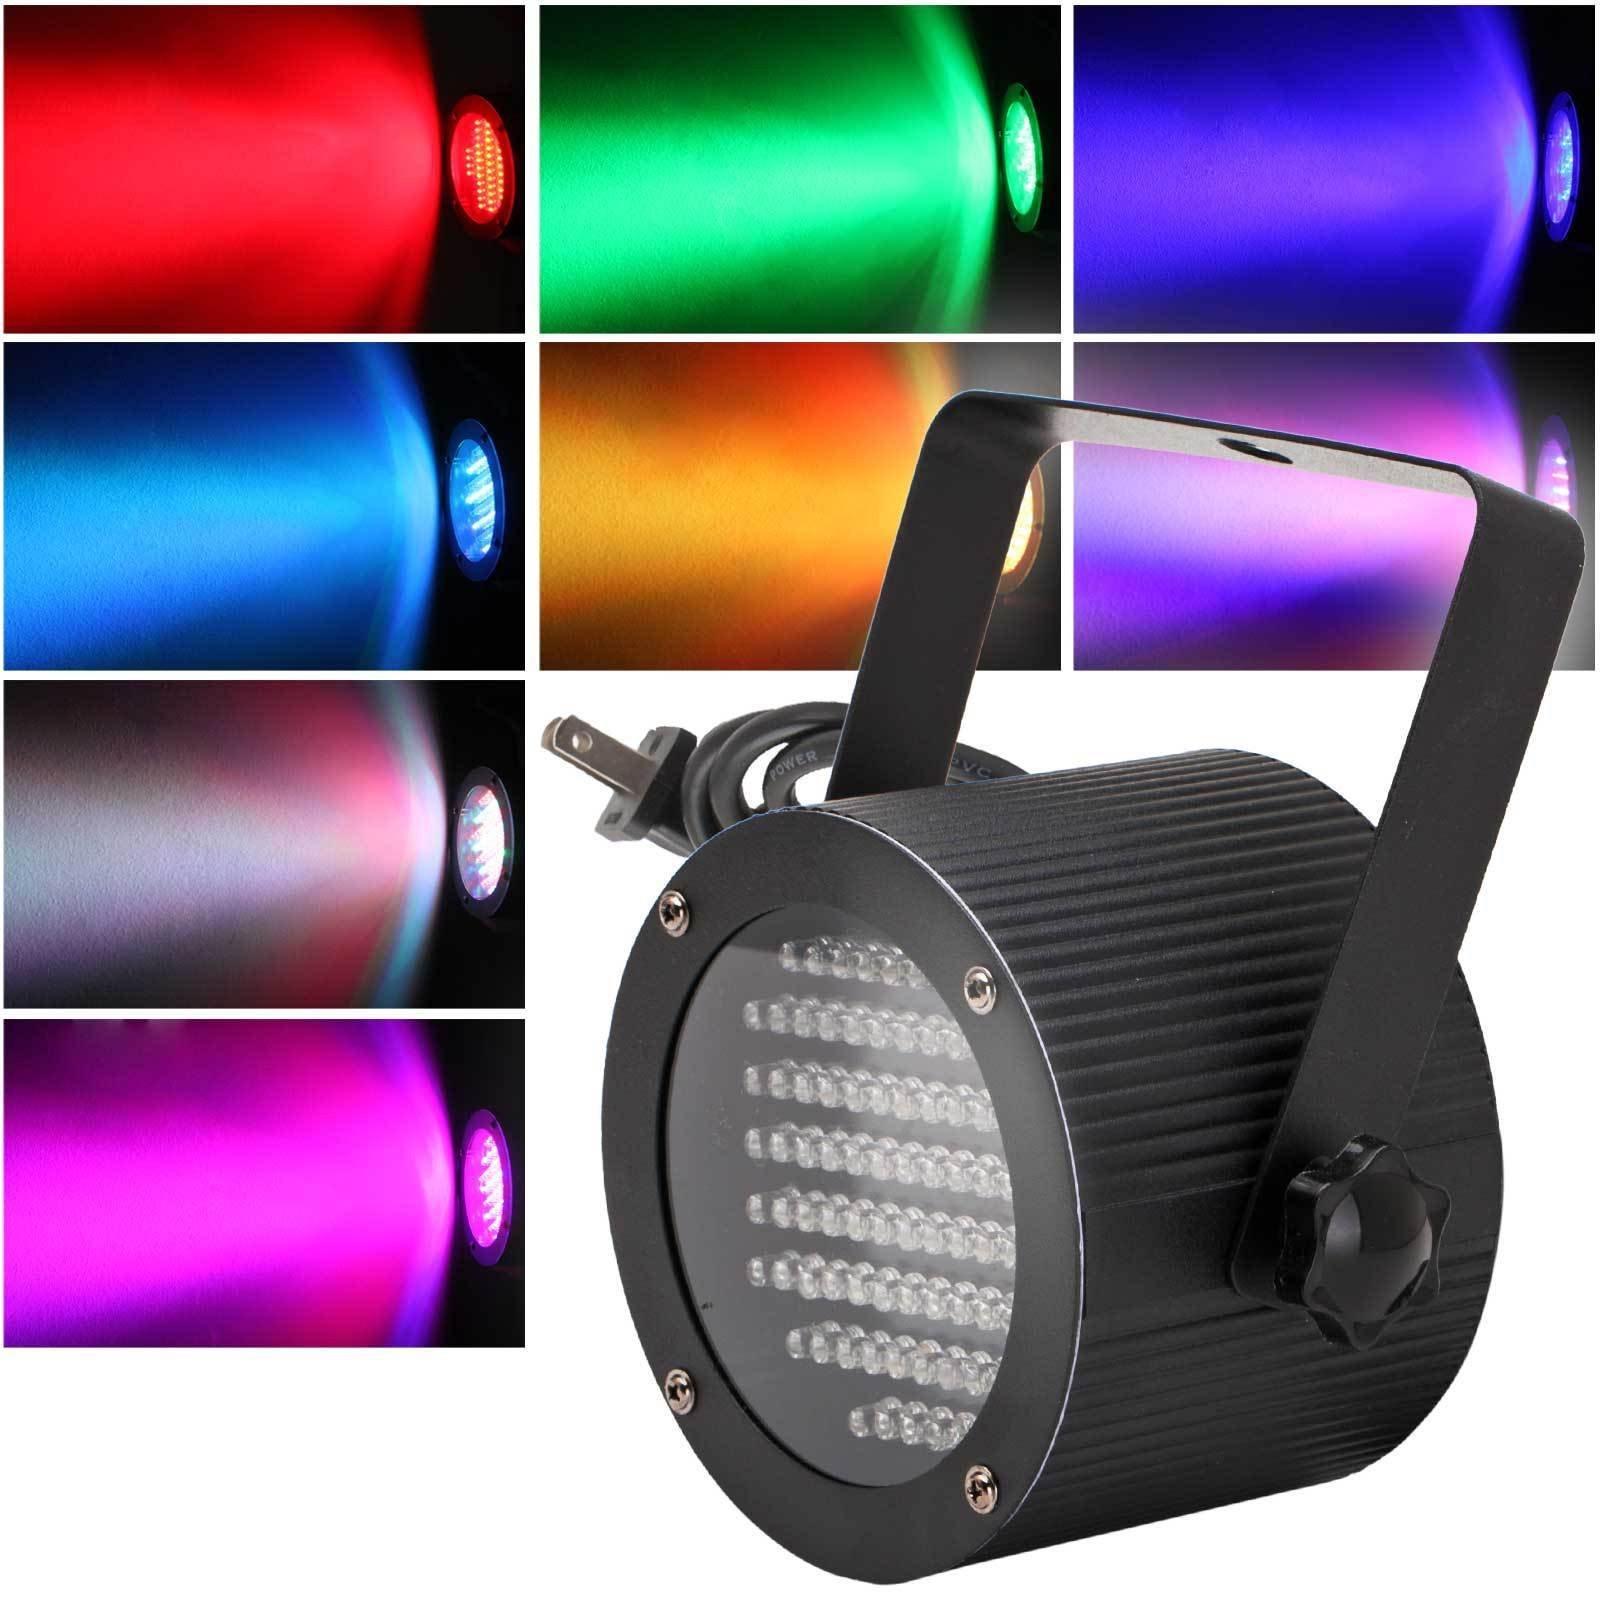 ALED LIGHT® Dmx512 86 Leds Par Stage Light Laser Lighting Rgb For Dj Disco Theater Ballroom Ktv Night Clubs Party Strobe Light Effects